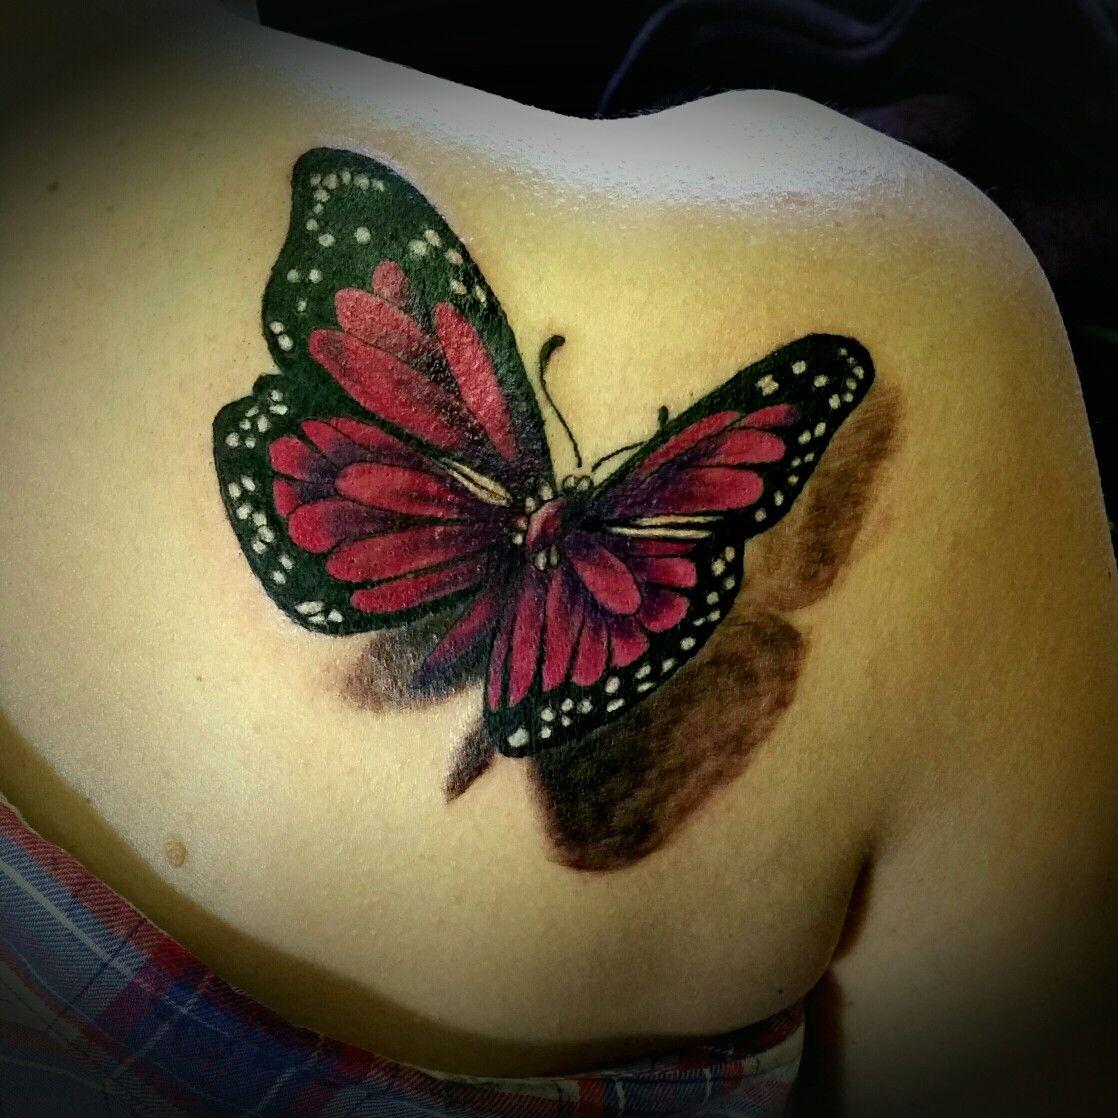 Butterfly 3d Tattoos for women flowers, Butterfly tattoo